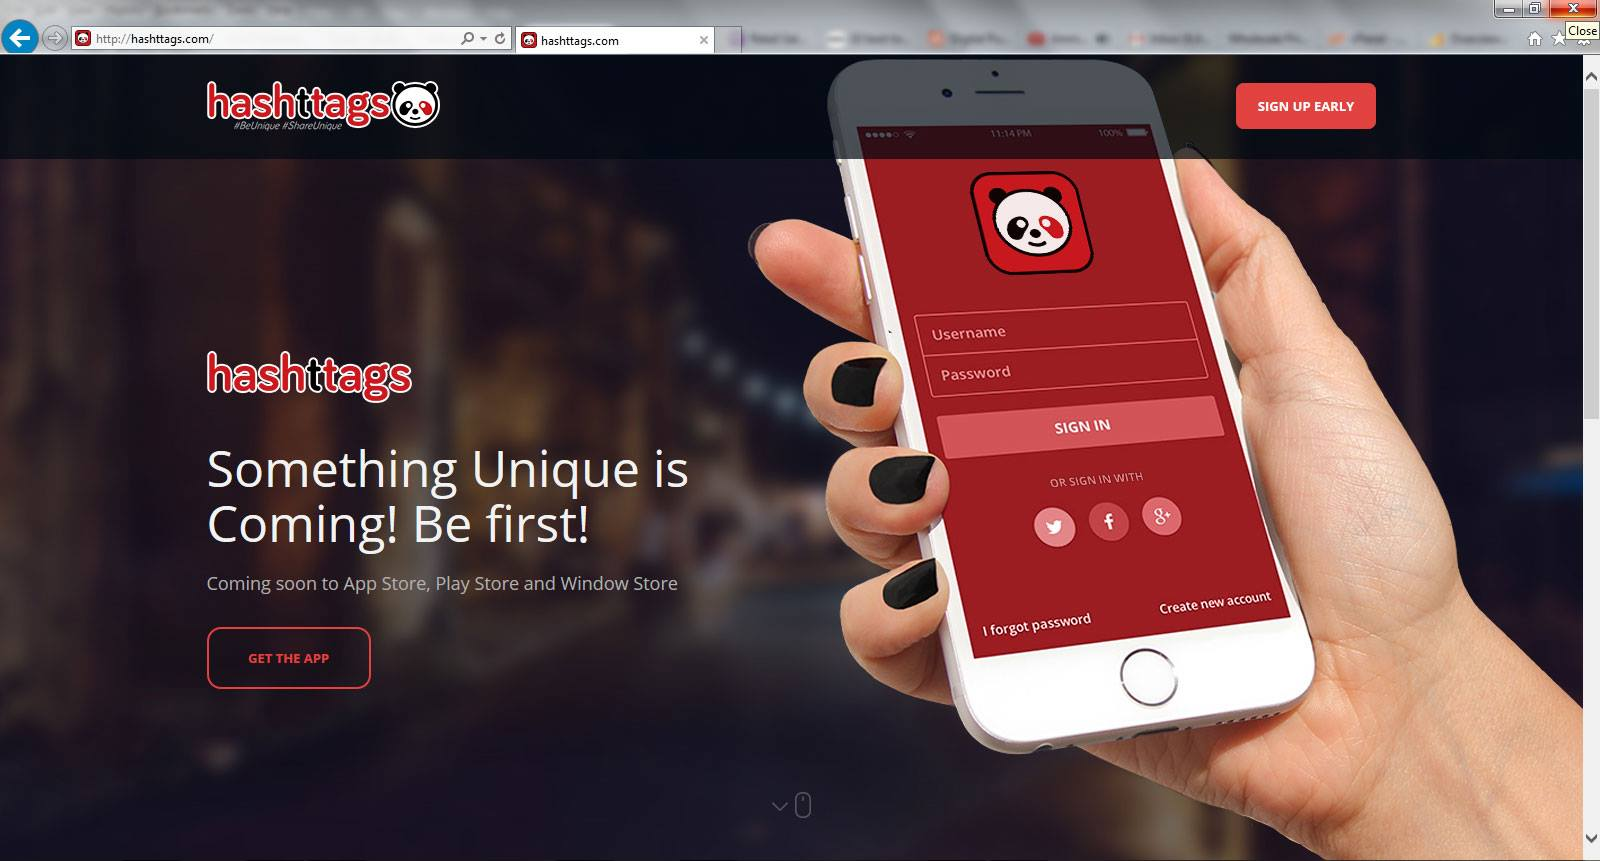 website-design-services-oc24.jpg